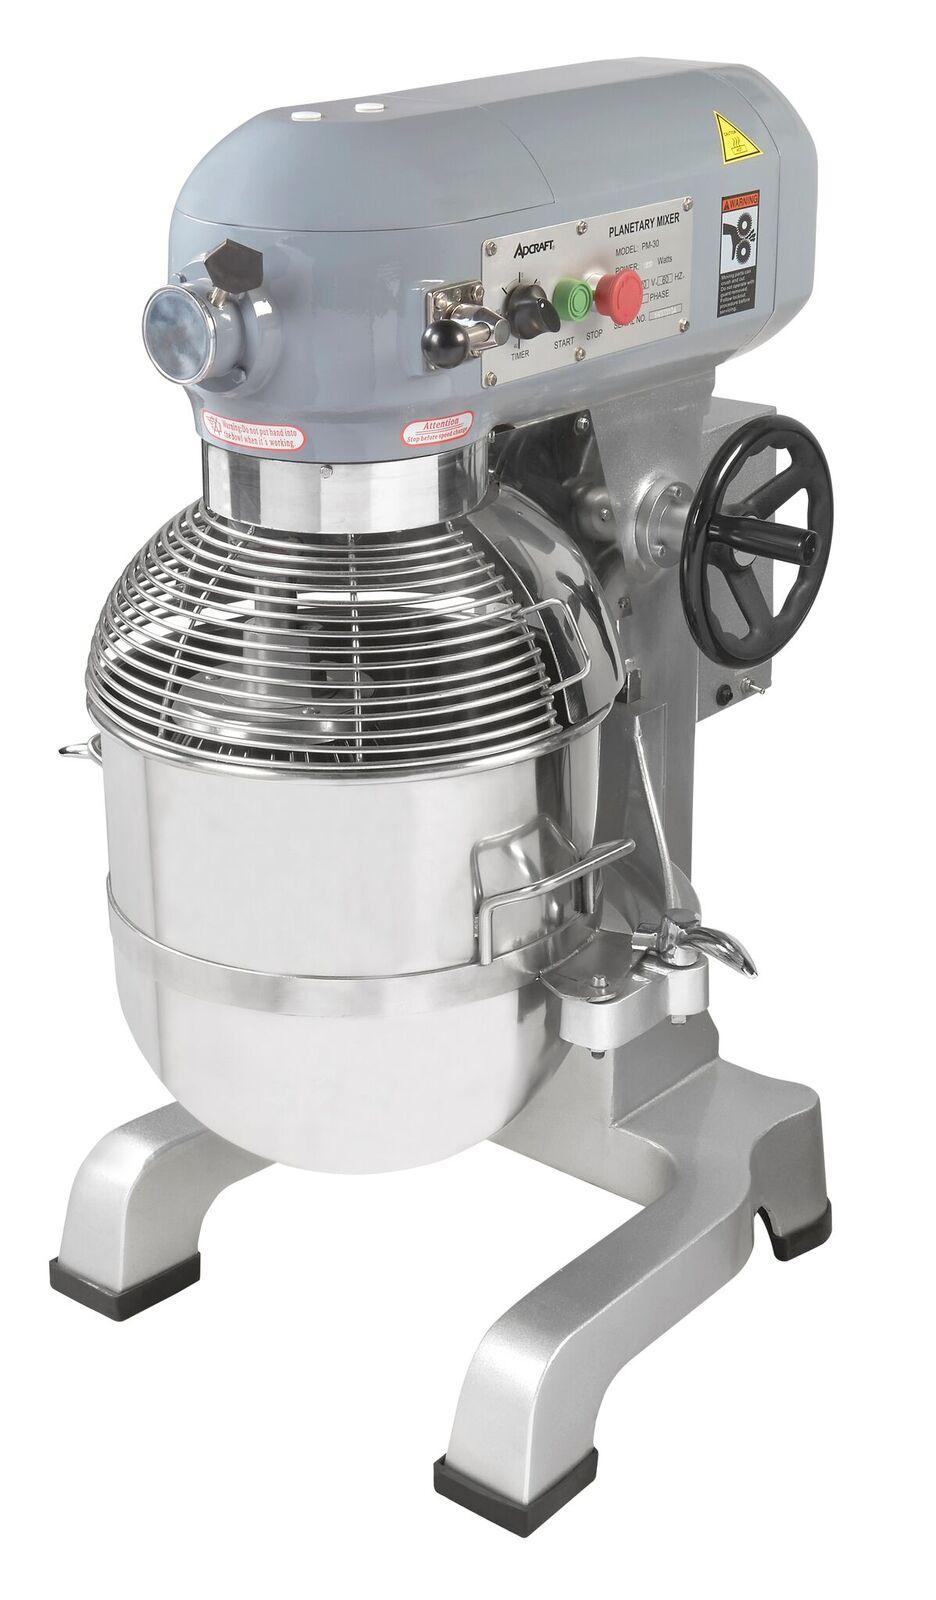 Admiral Craft BDPM-30 planetary mixer